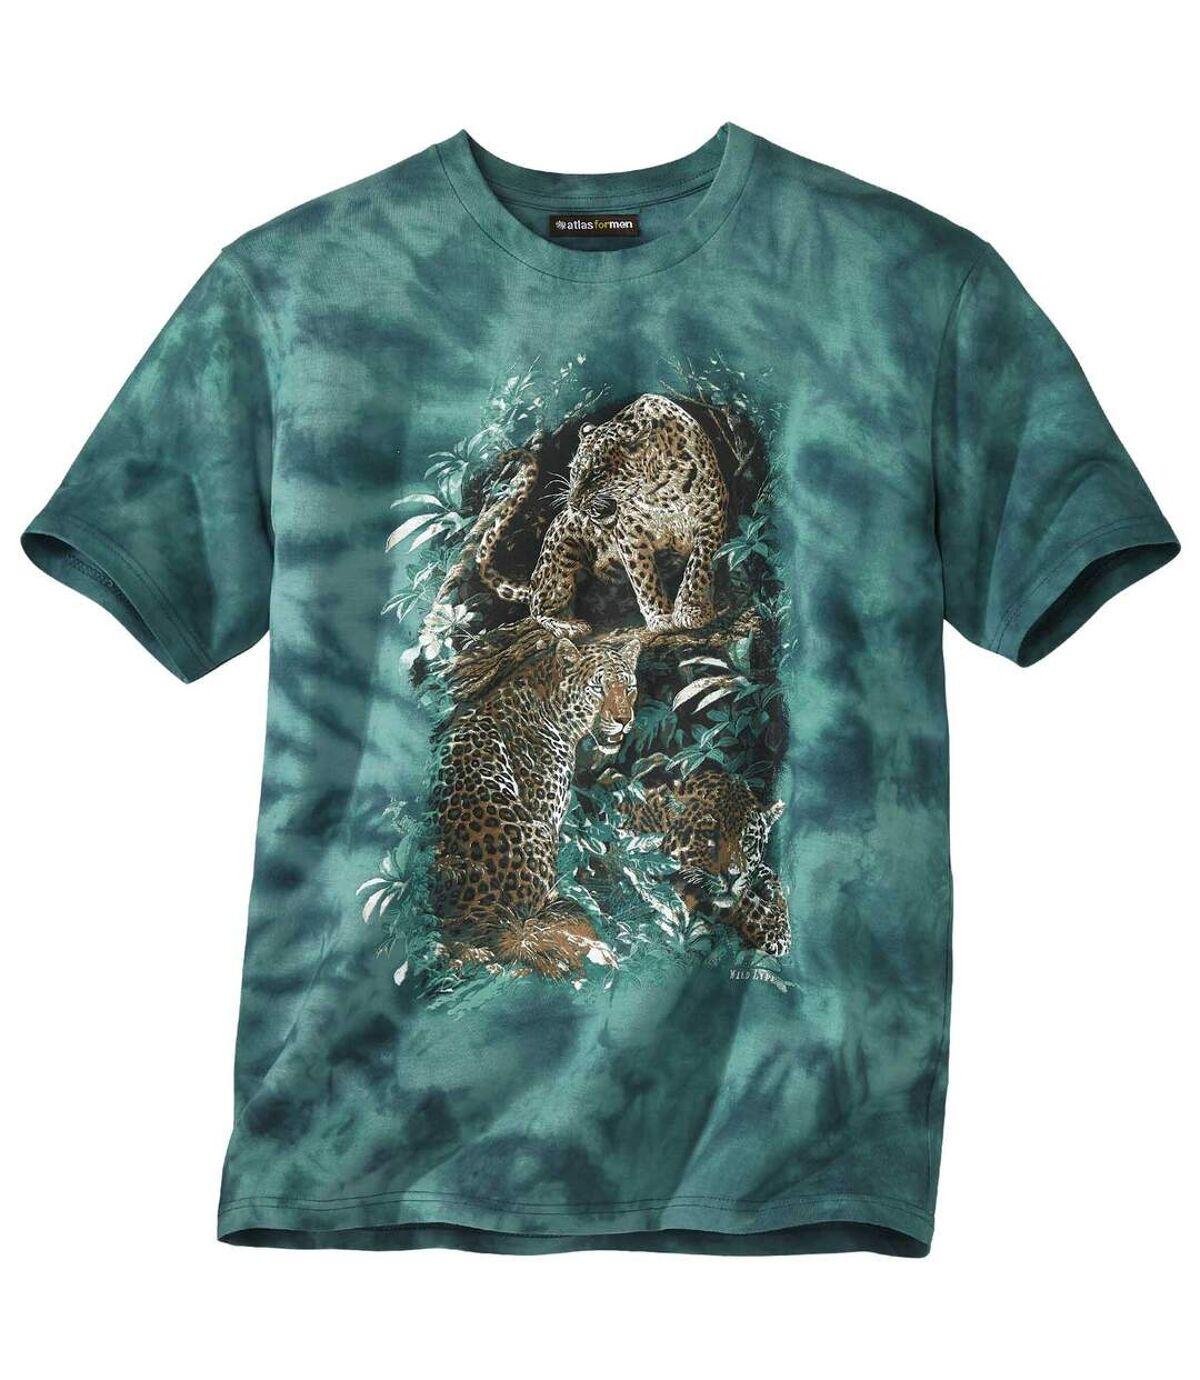 Men's Green Tie-Dye T-Shirt with Panther Print Atlas For Men